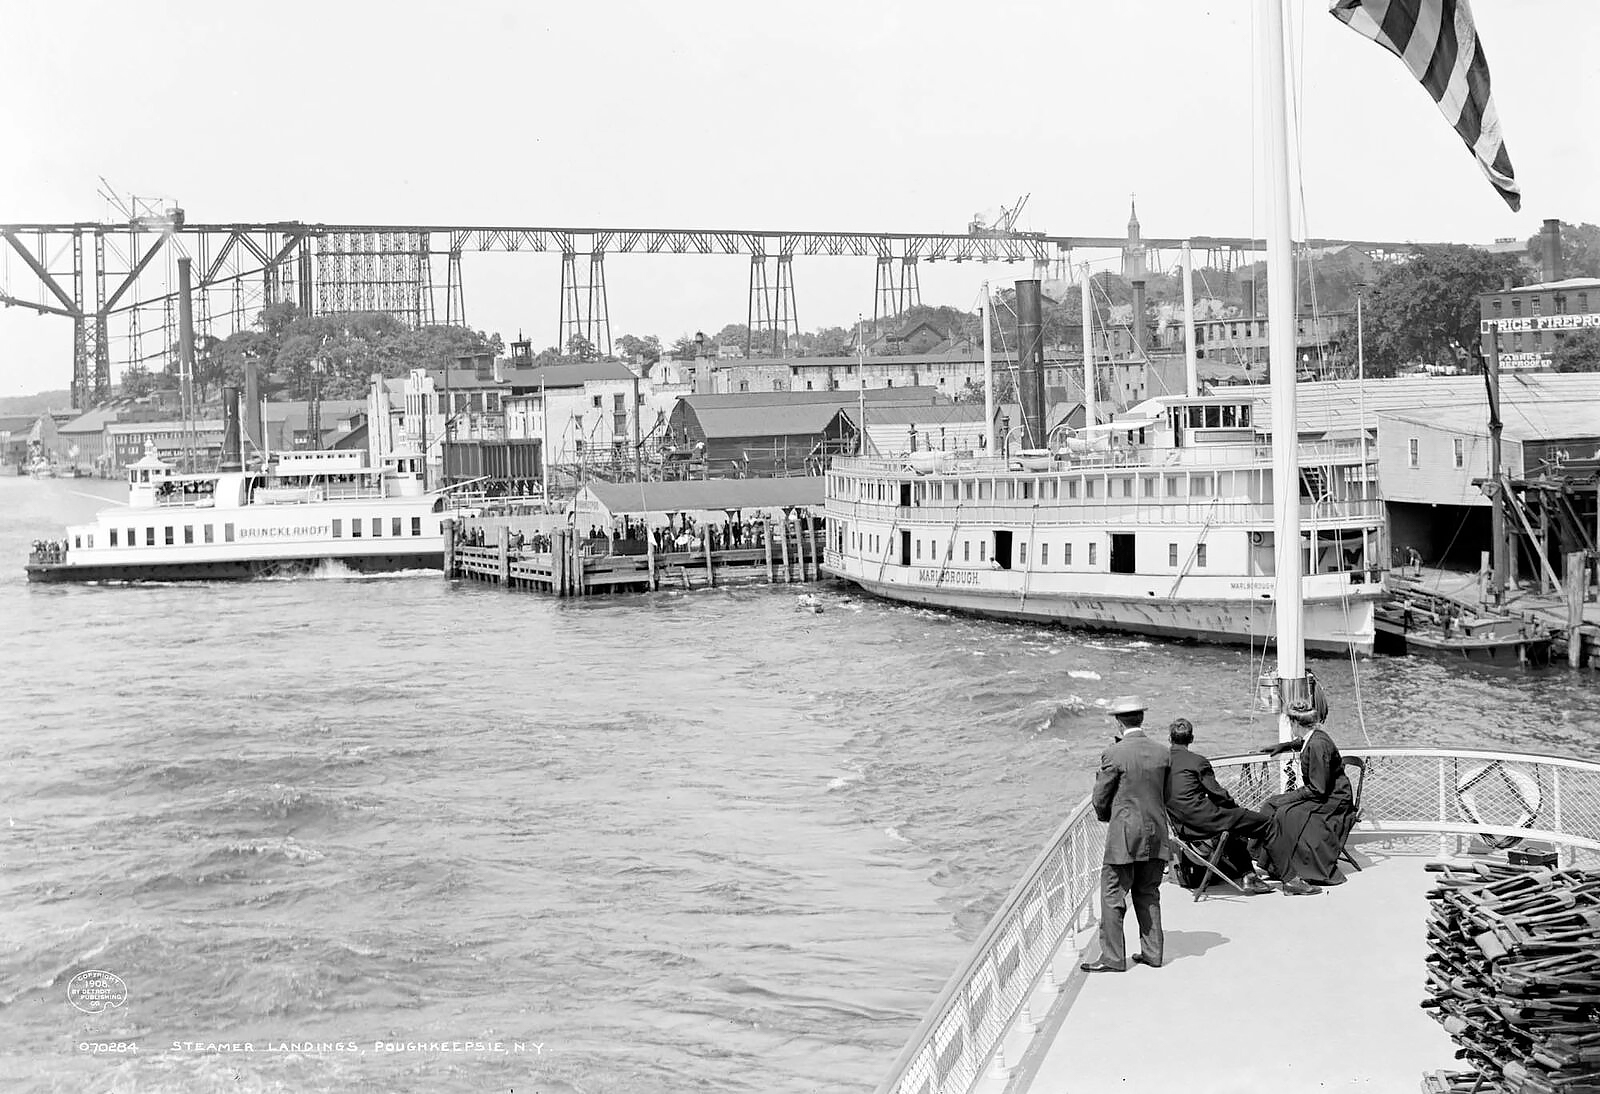 Steamer Landings At Poughkeepsie NY c1907